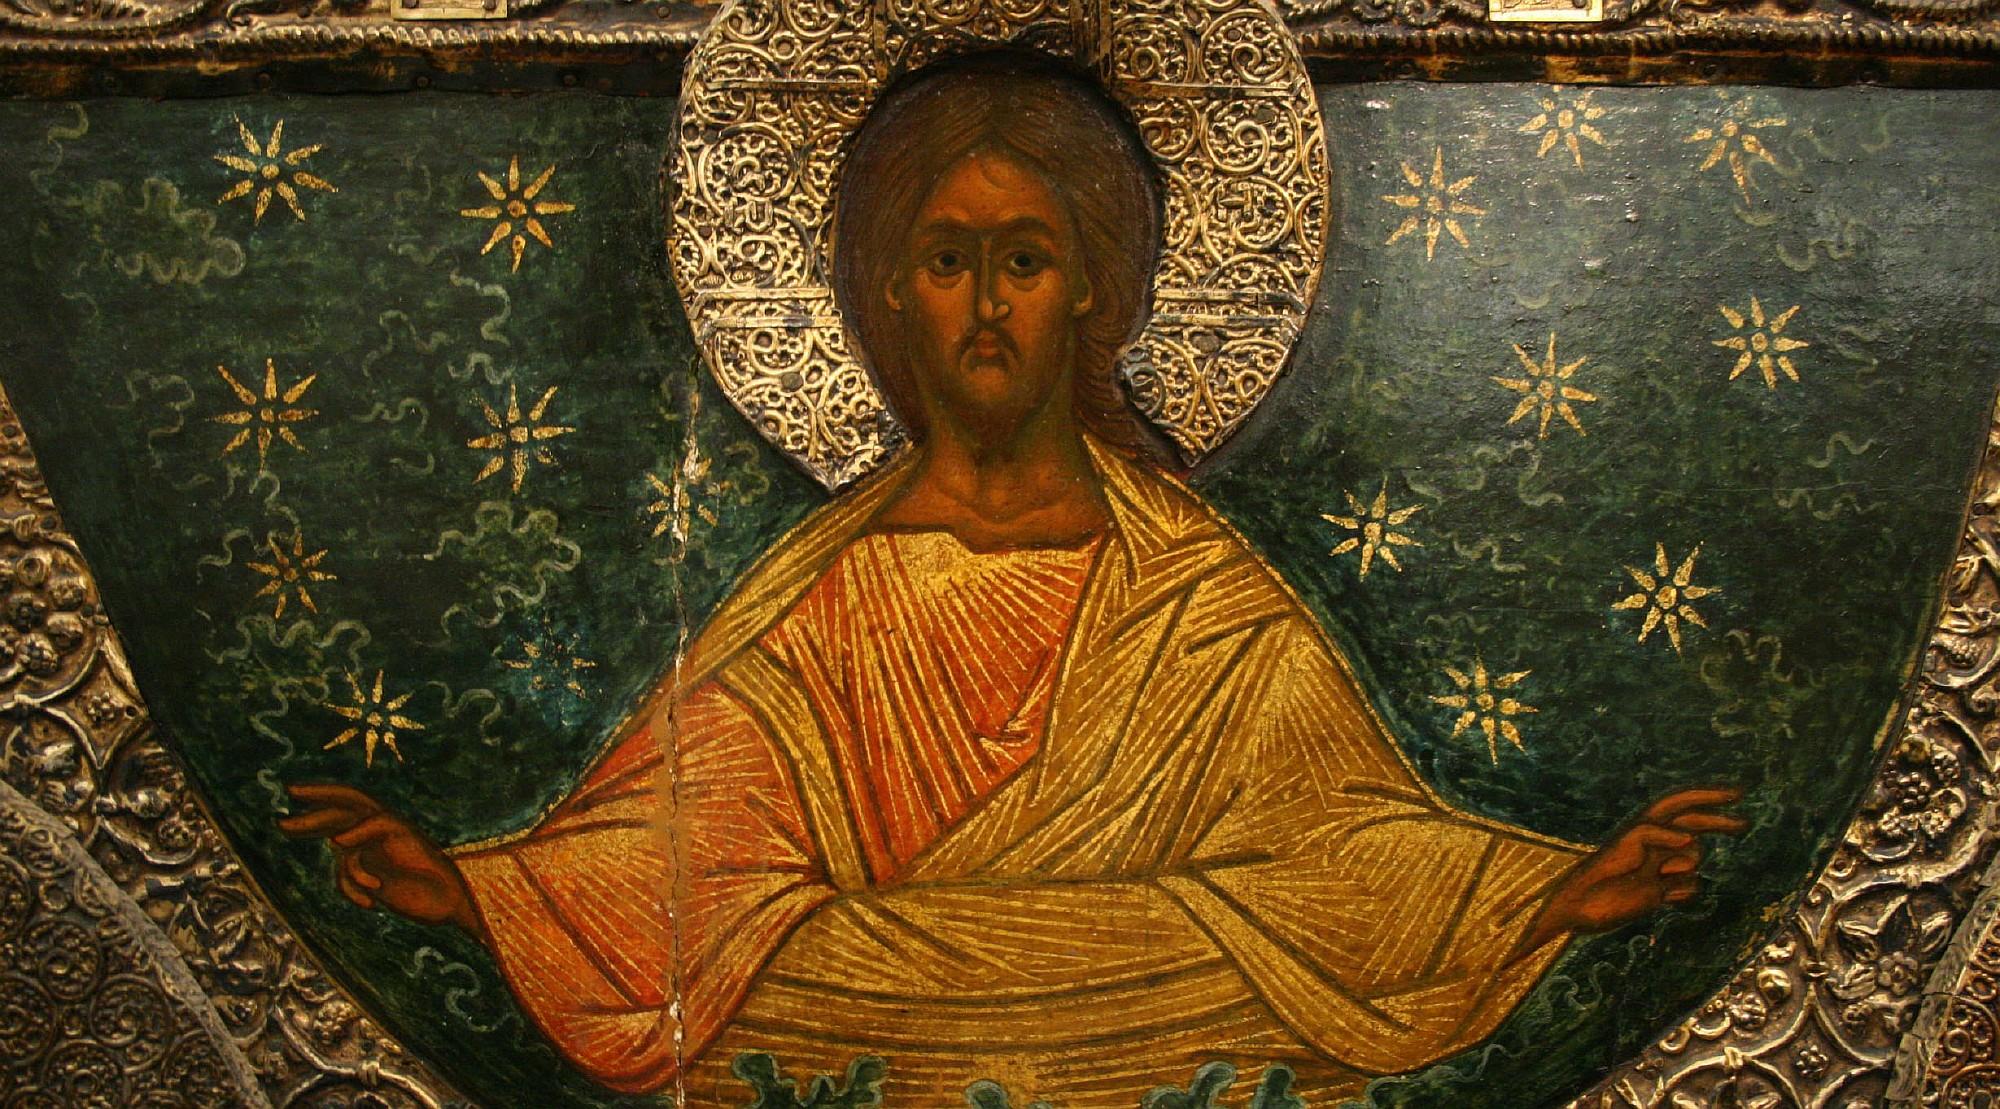 Канон Исусу Христу умилительный